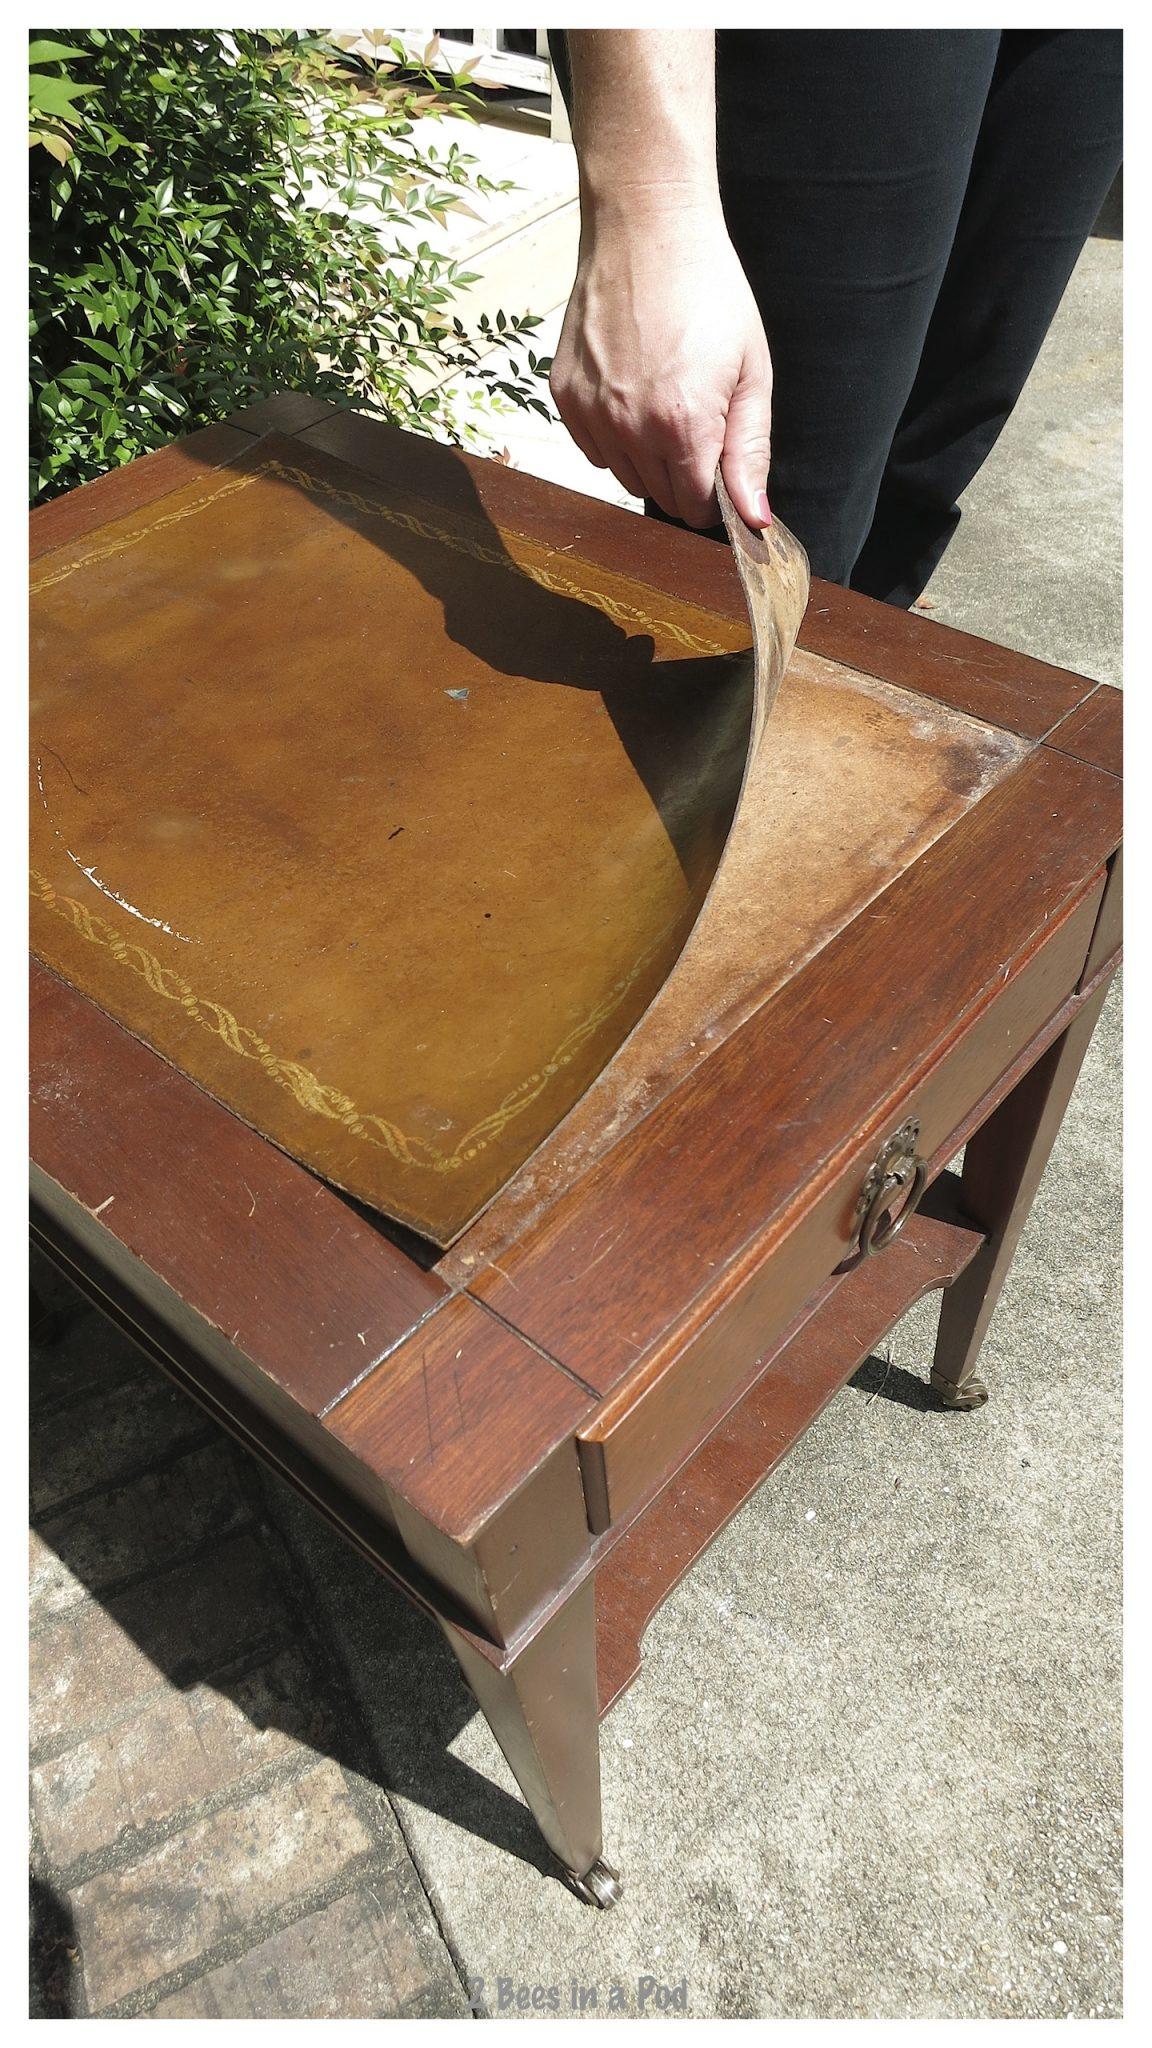 Tiffany table - before